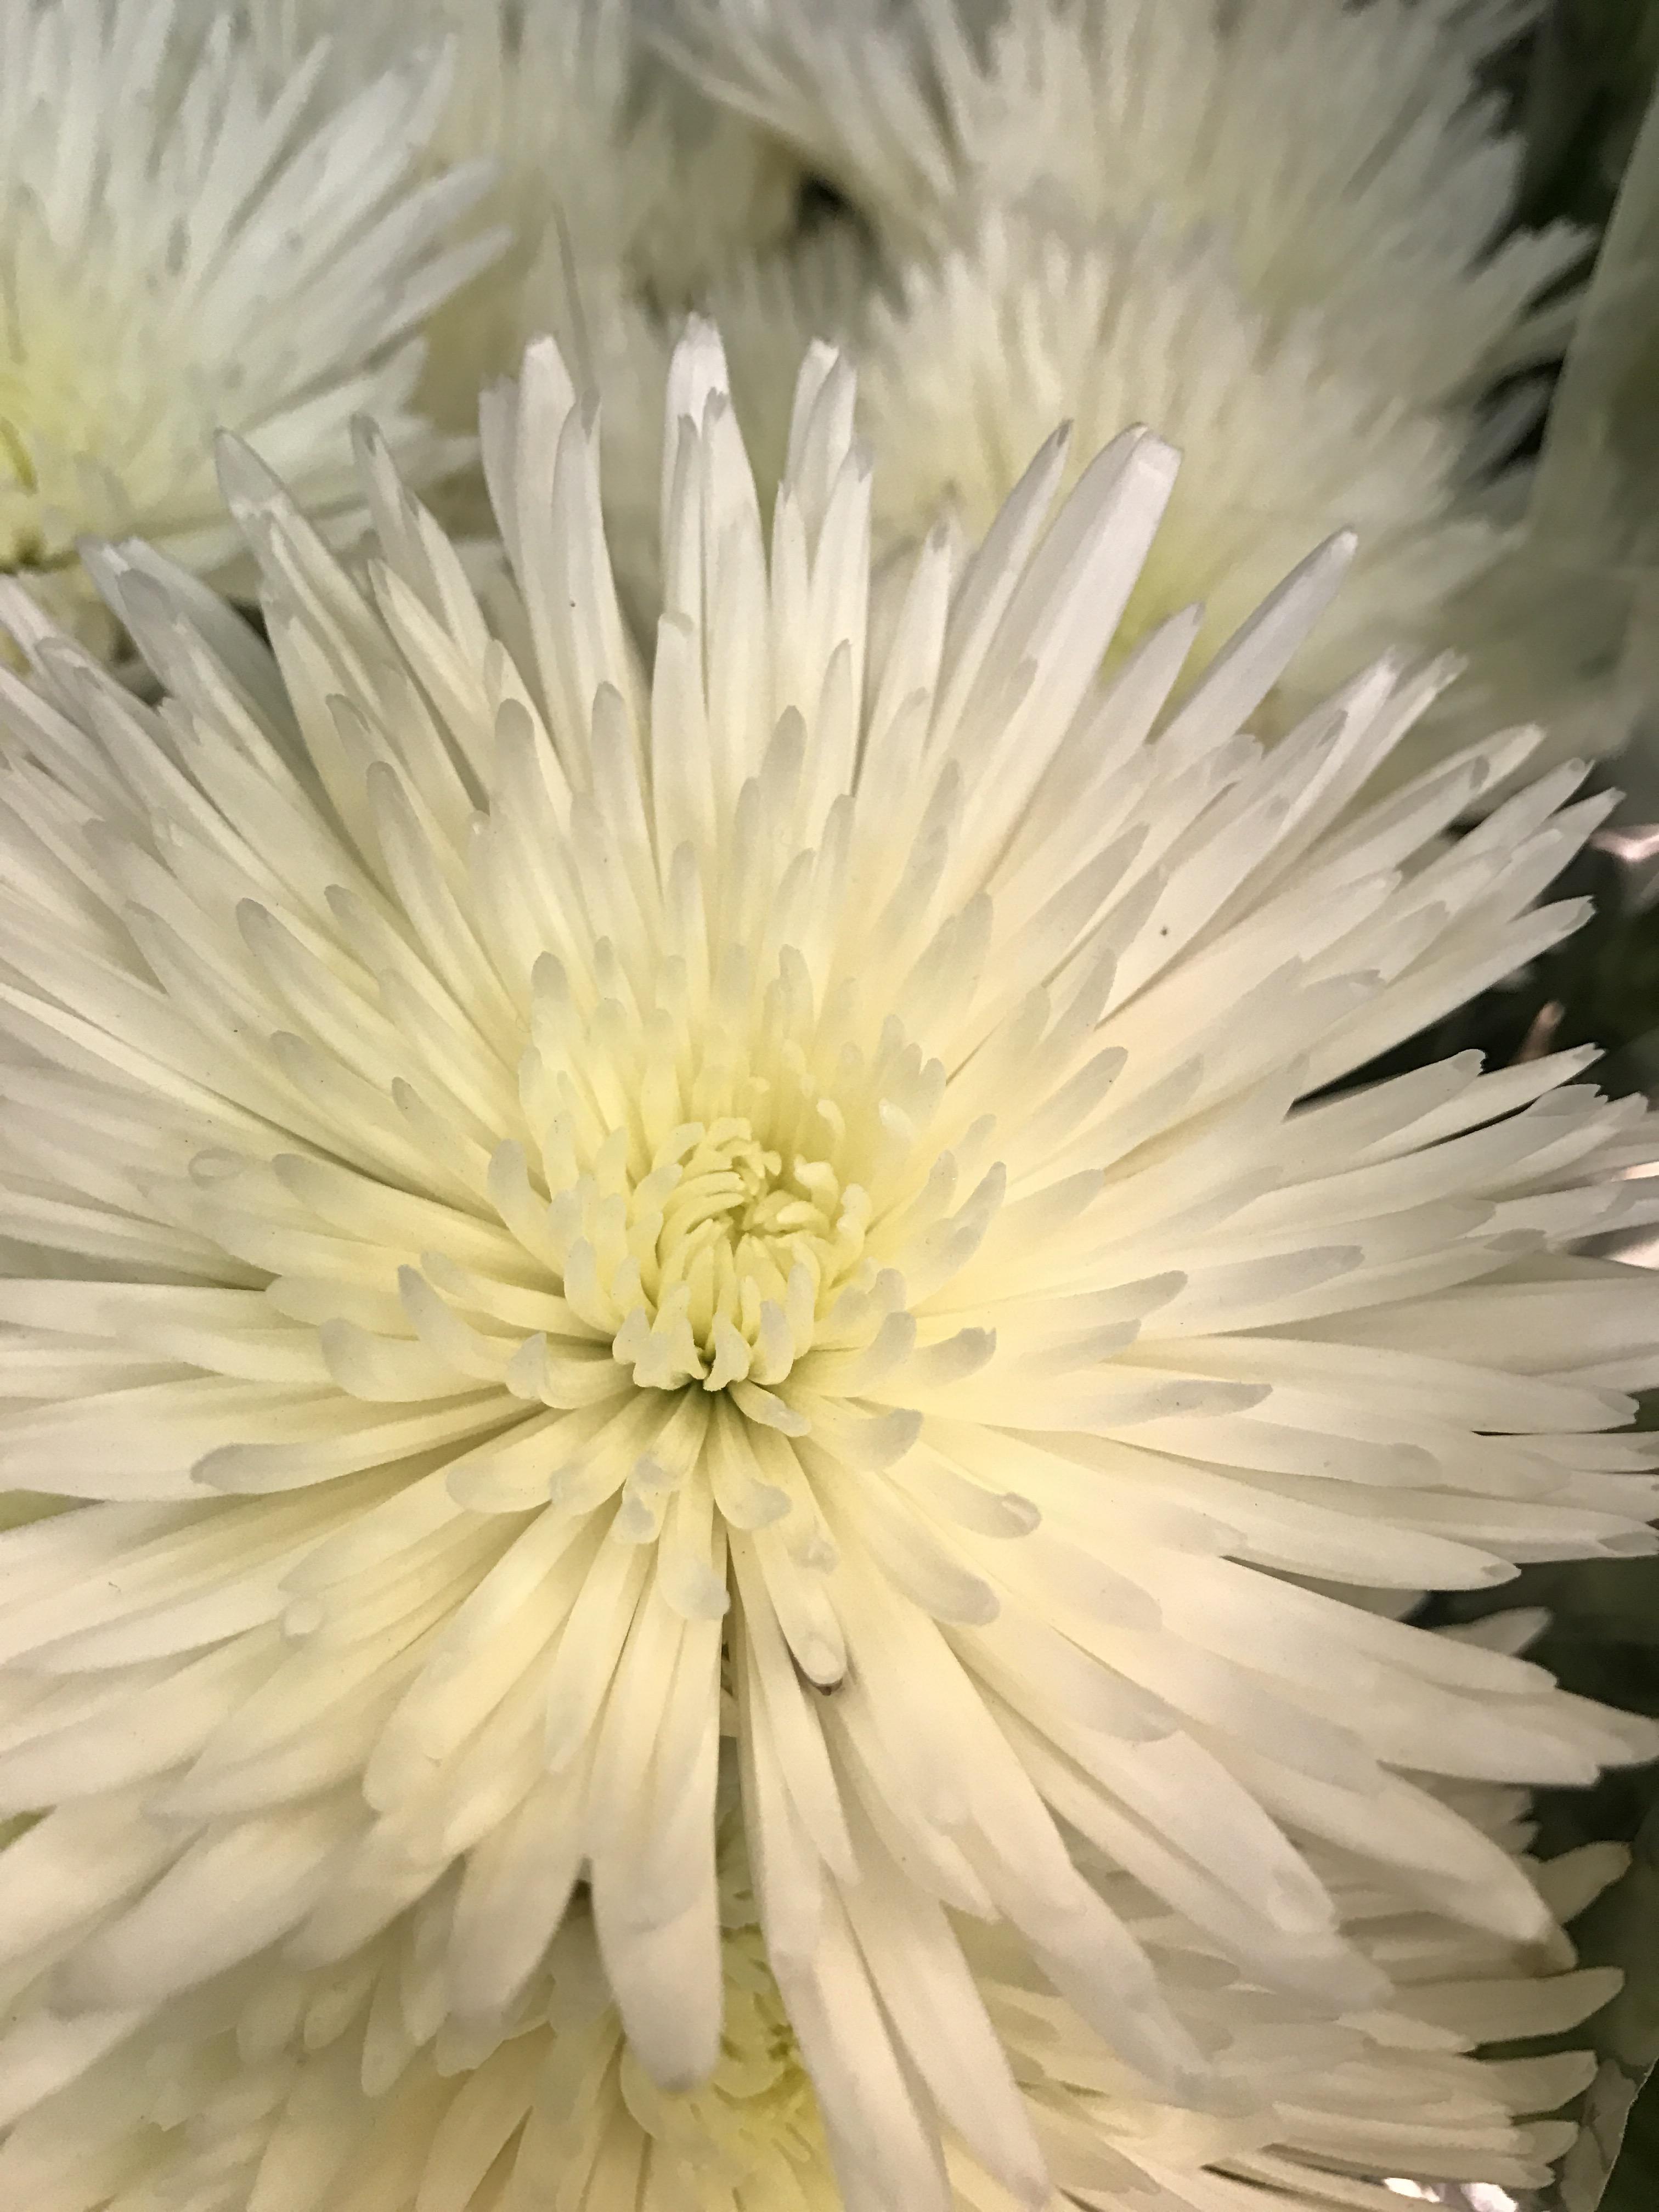 White Flower Teleportingweena